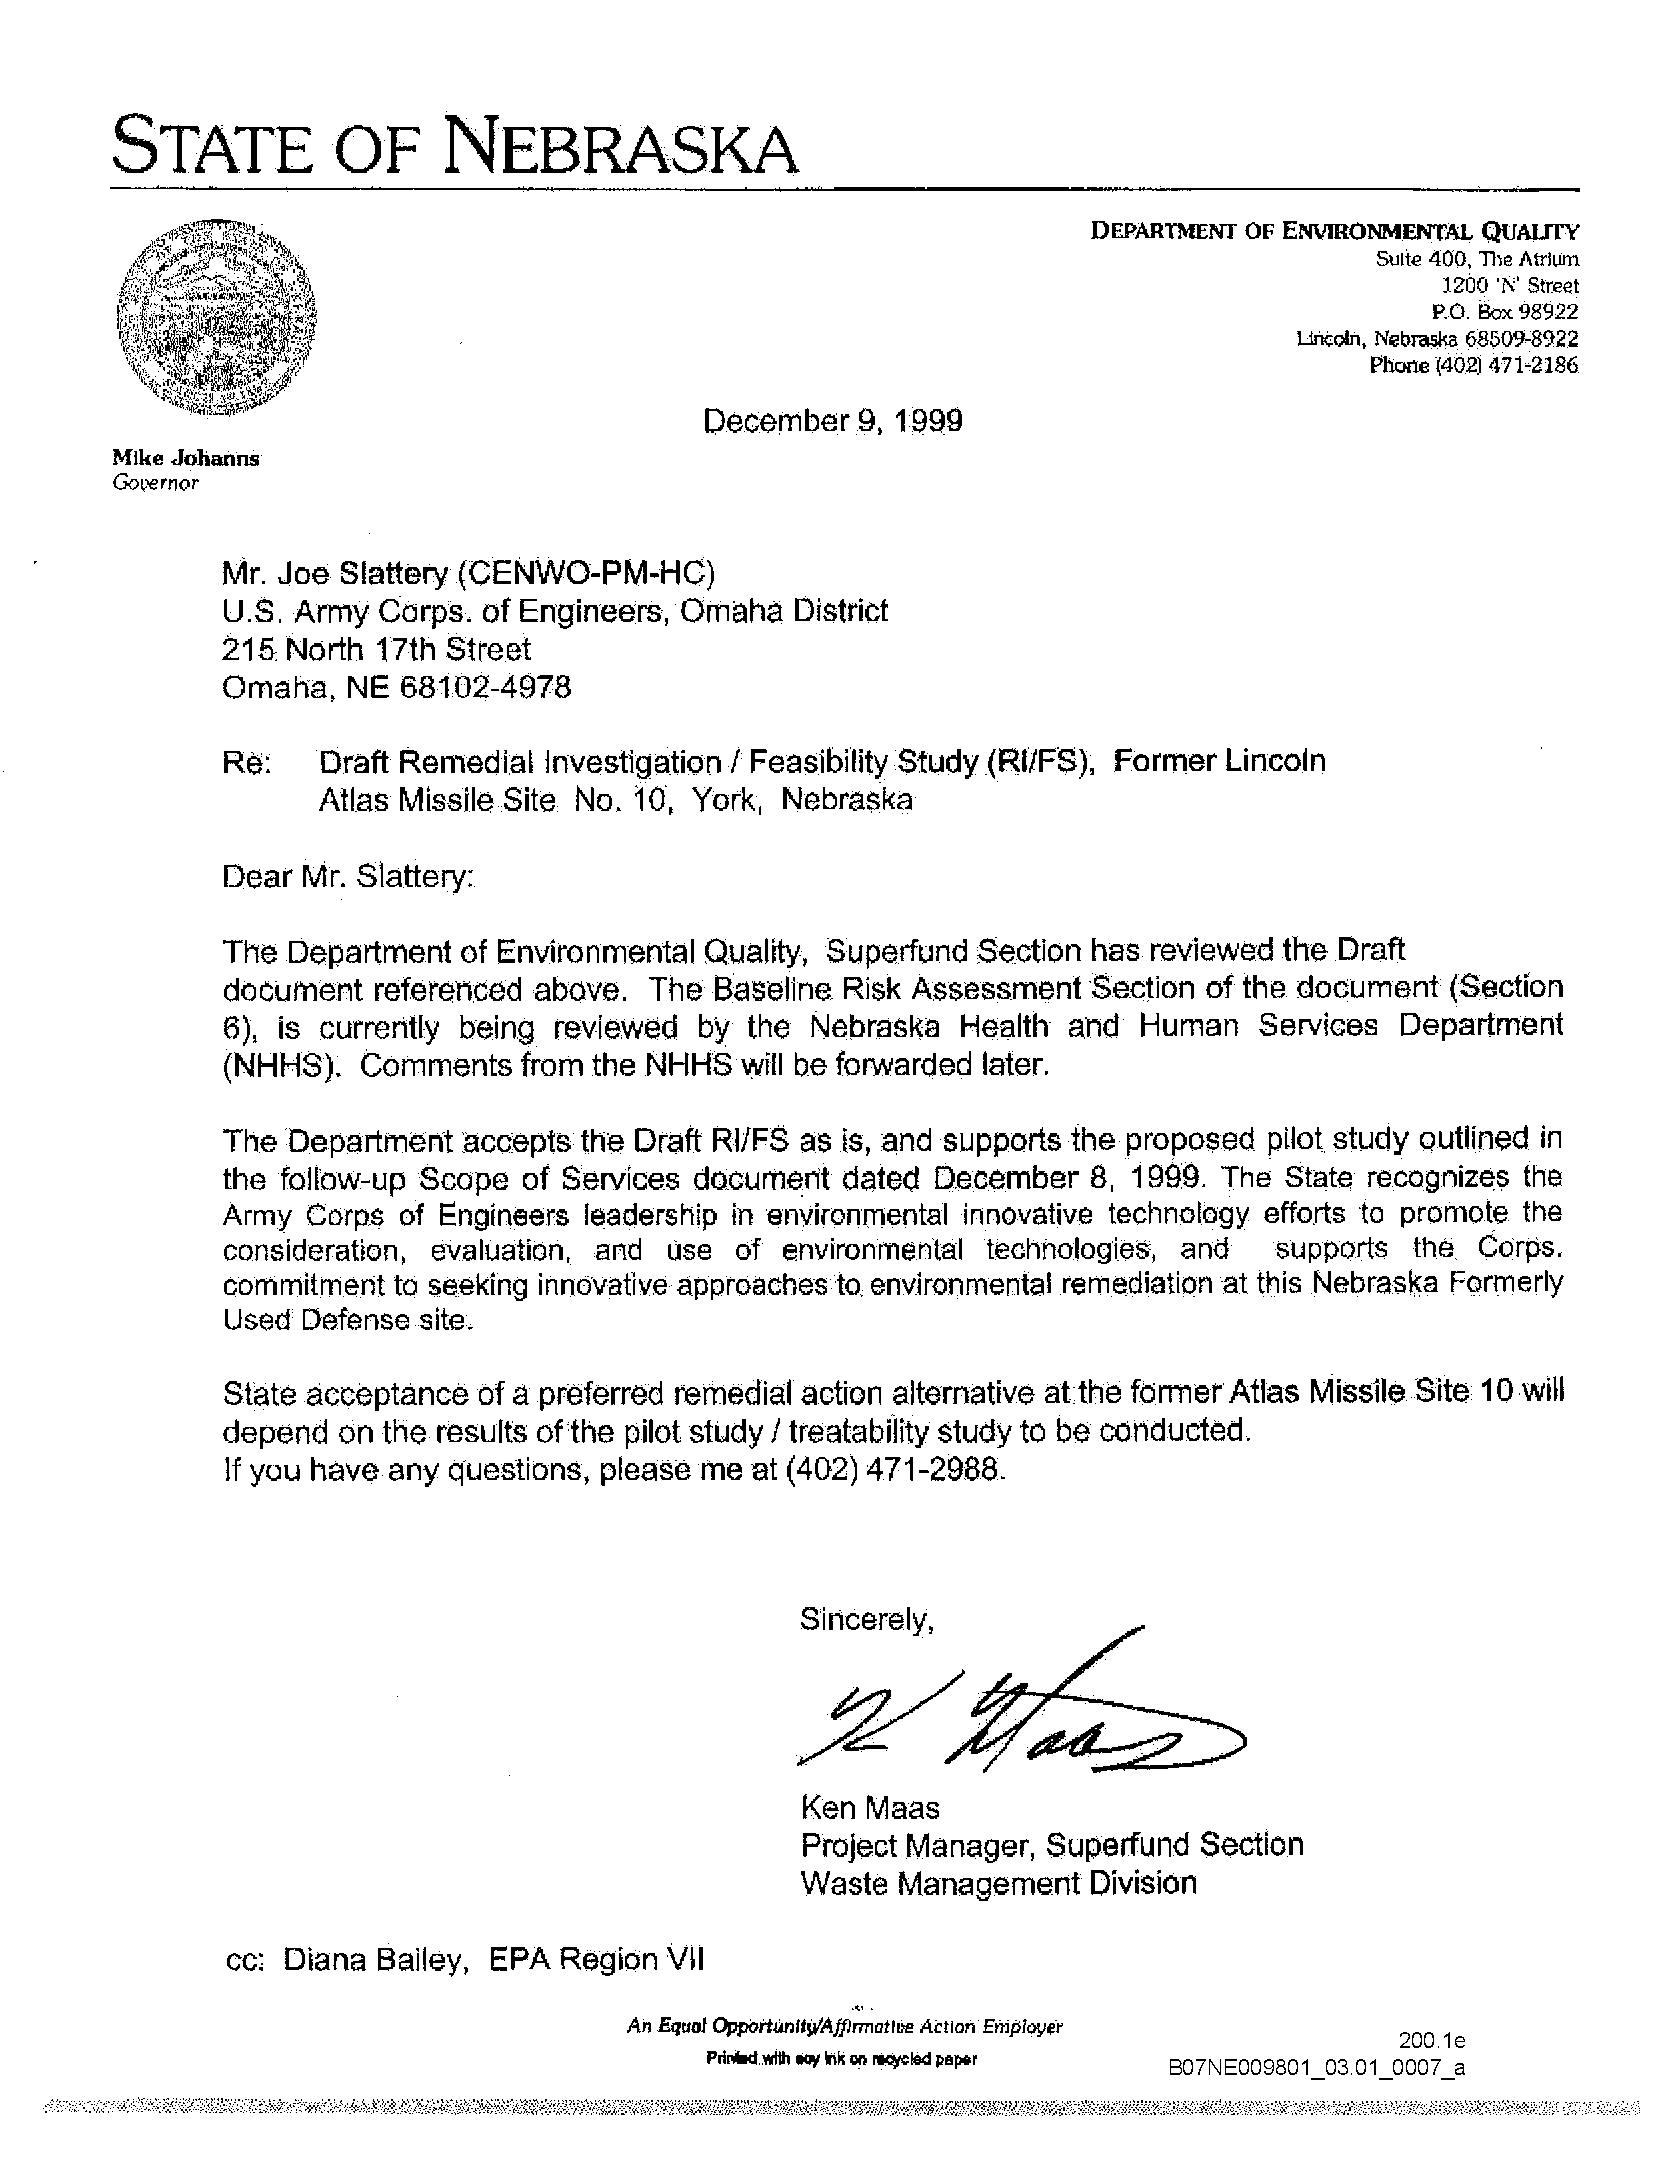 Re: Draft Remedial Investigation/Feasibility Study (RI/FS), Former